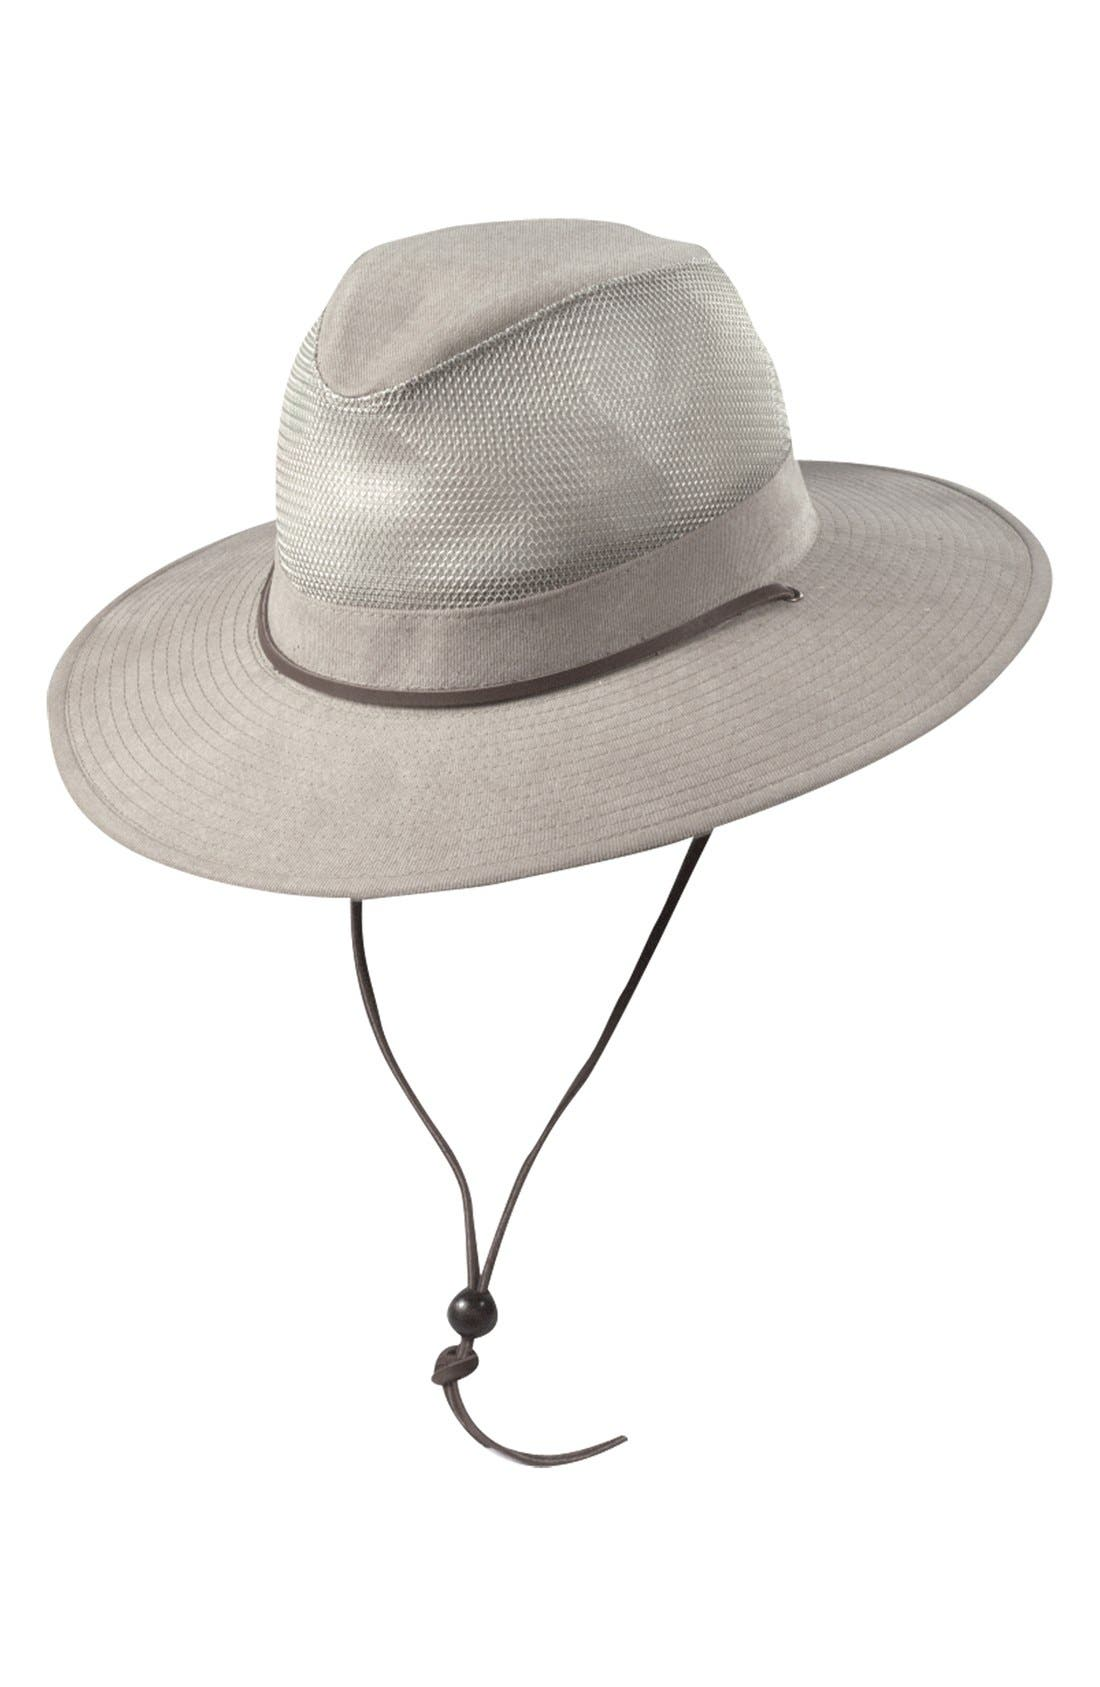 Dorfman Pacific Brushed Twill Safari Hat